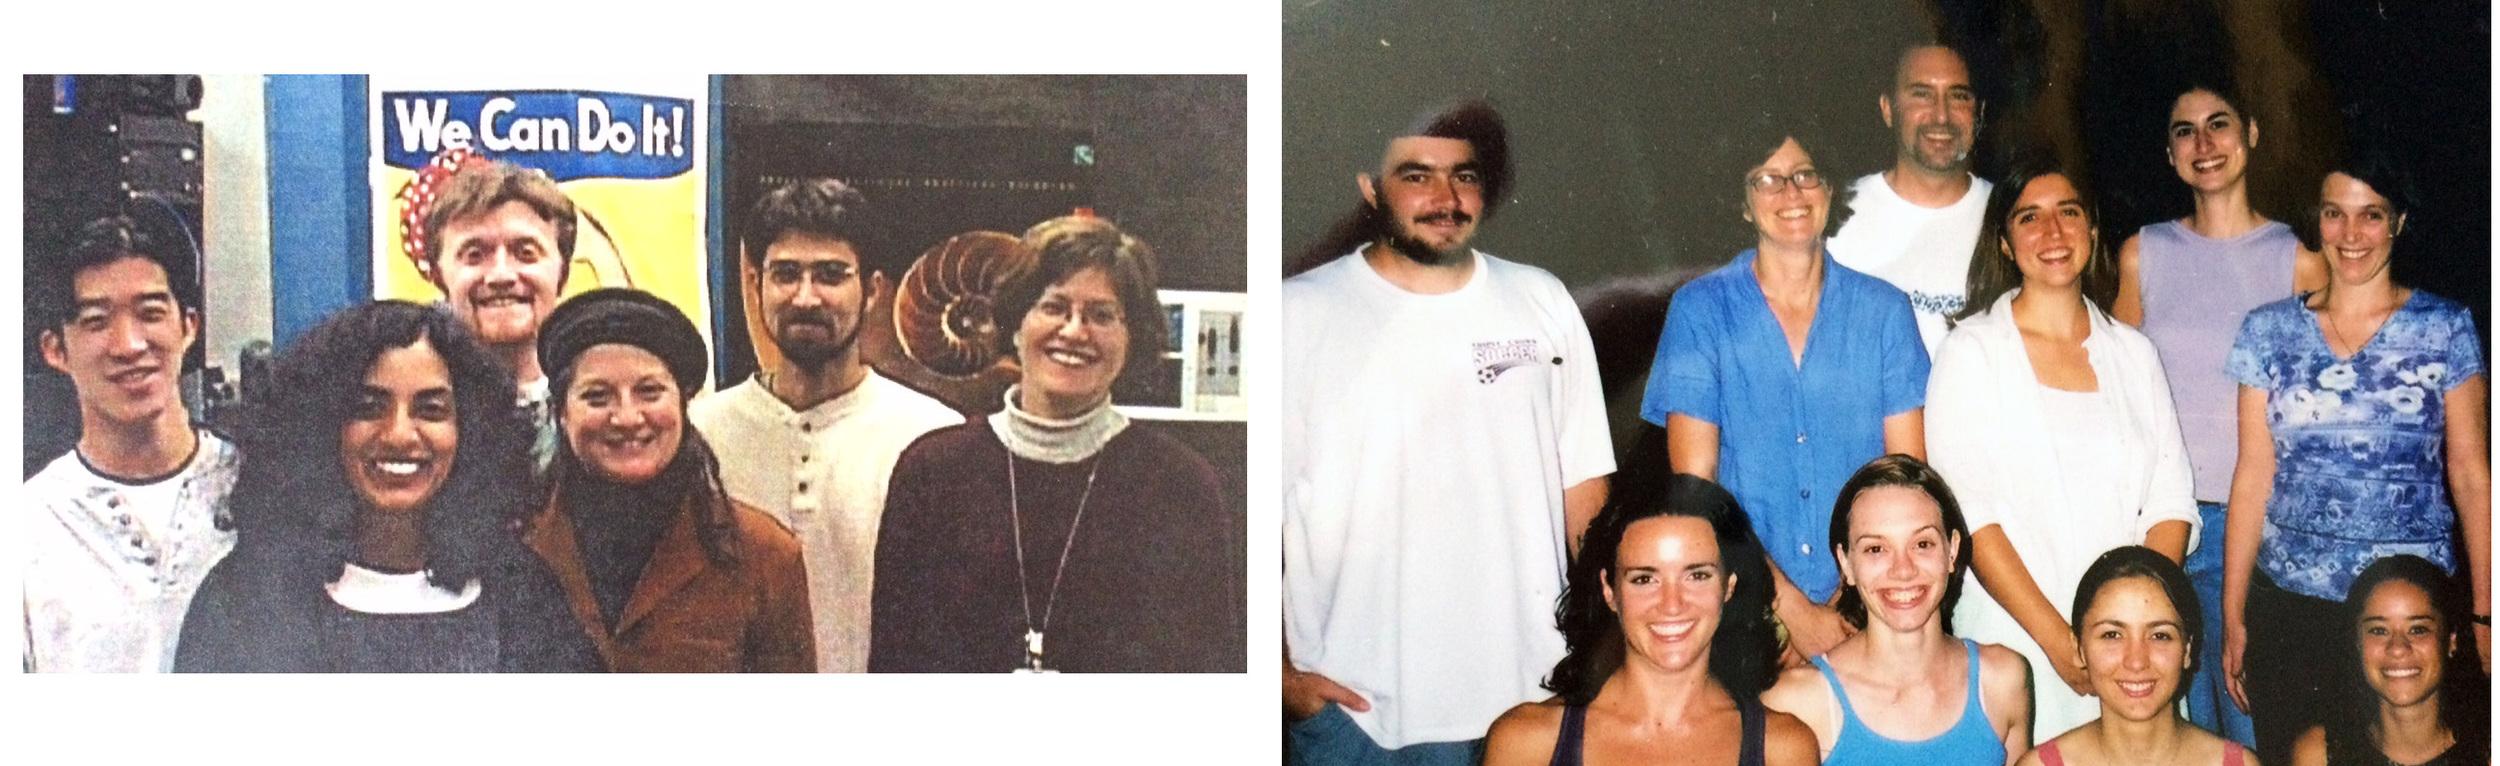 LEFT: 1999 (NIH), Bryan Hwang, Rukki, Rick, Peg Coulombe, Josh and Marla; RIGHT: 2003 (UCSD) BACK: Tim, Marla, Michael, Christine, Kristi Hansen, Sally. FRONT: Jenel Bosze, Gianna Muir-Robinson, Ninaz Shiva, Angel Jimenez